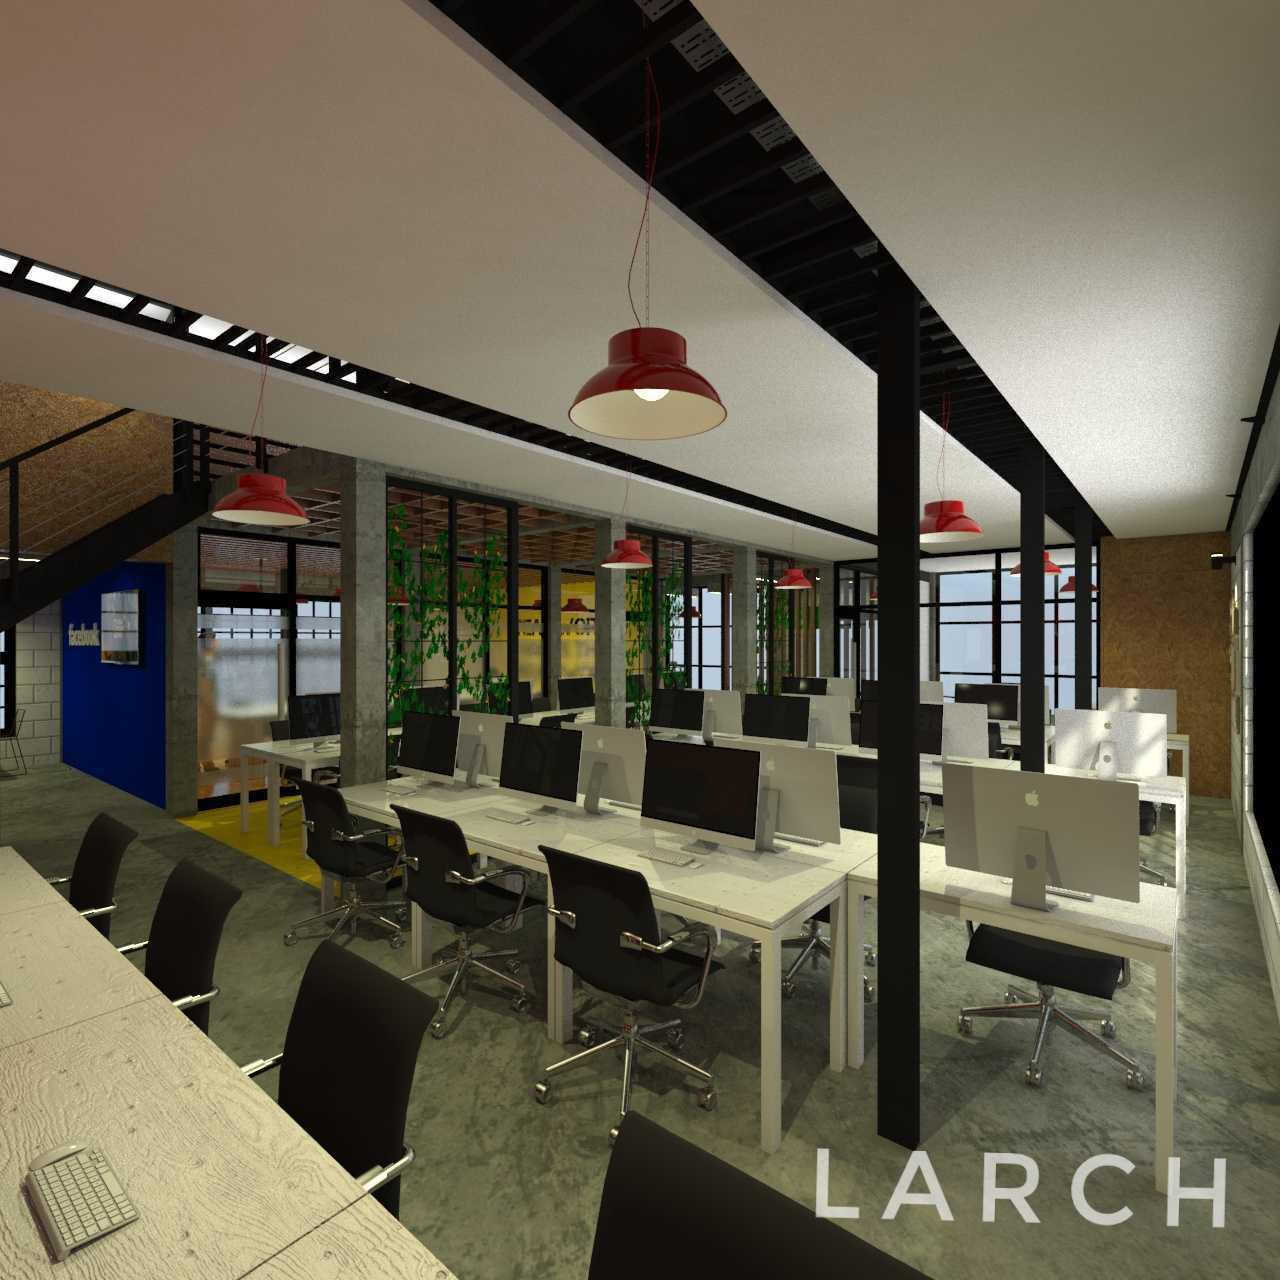 Larch Architecture Team Kantor Herbaltv Tasikmalaya, Jawa Barat, Indonesia Tasikmalaya, Jawa Barat, Indonesia Larch-Architecture-Team-Kantor-Herbaltv Industrial  67044